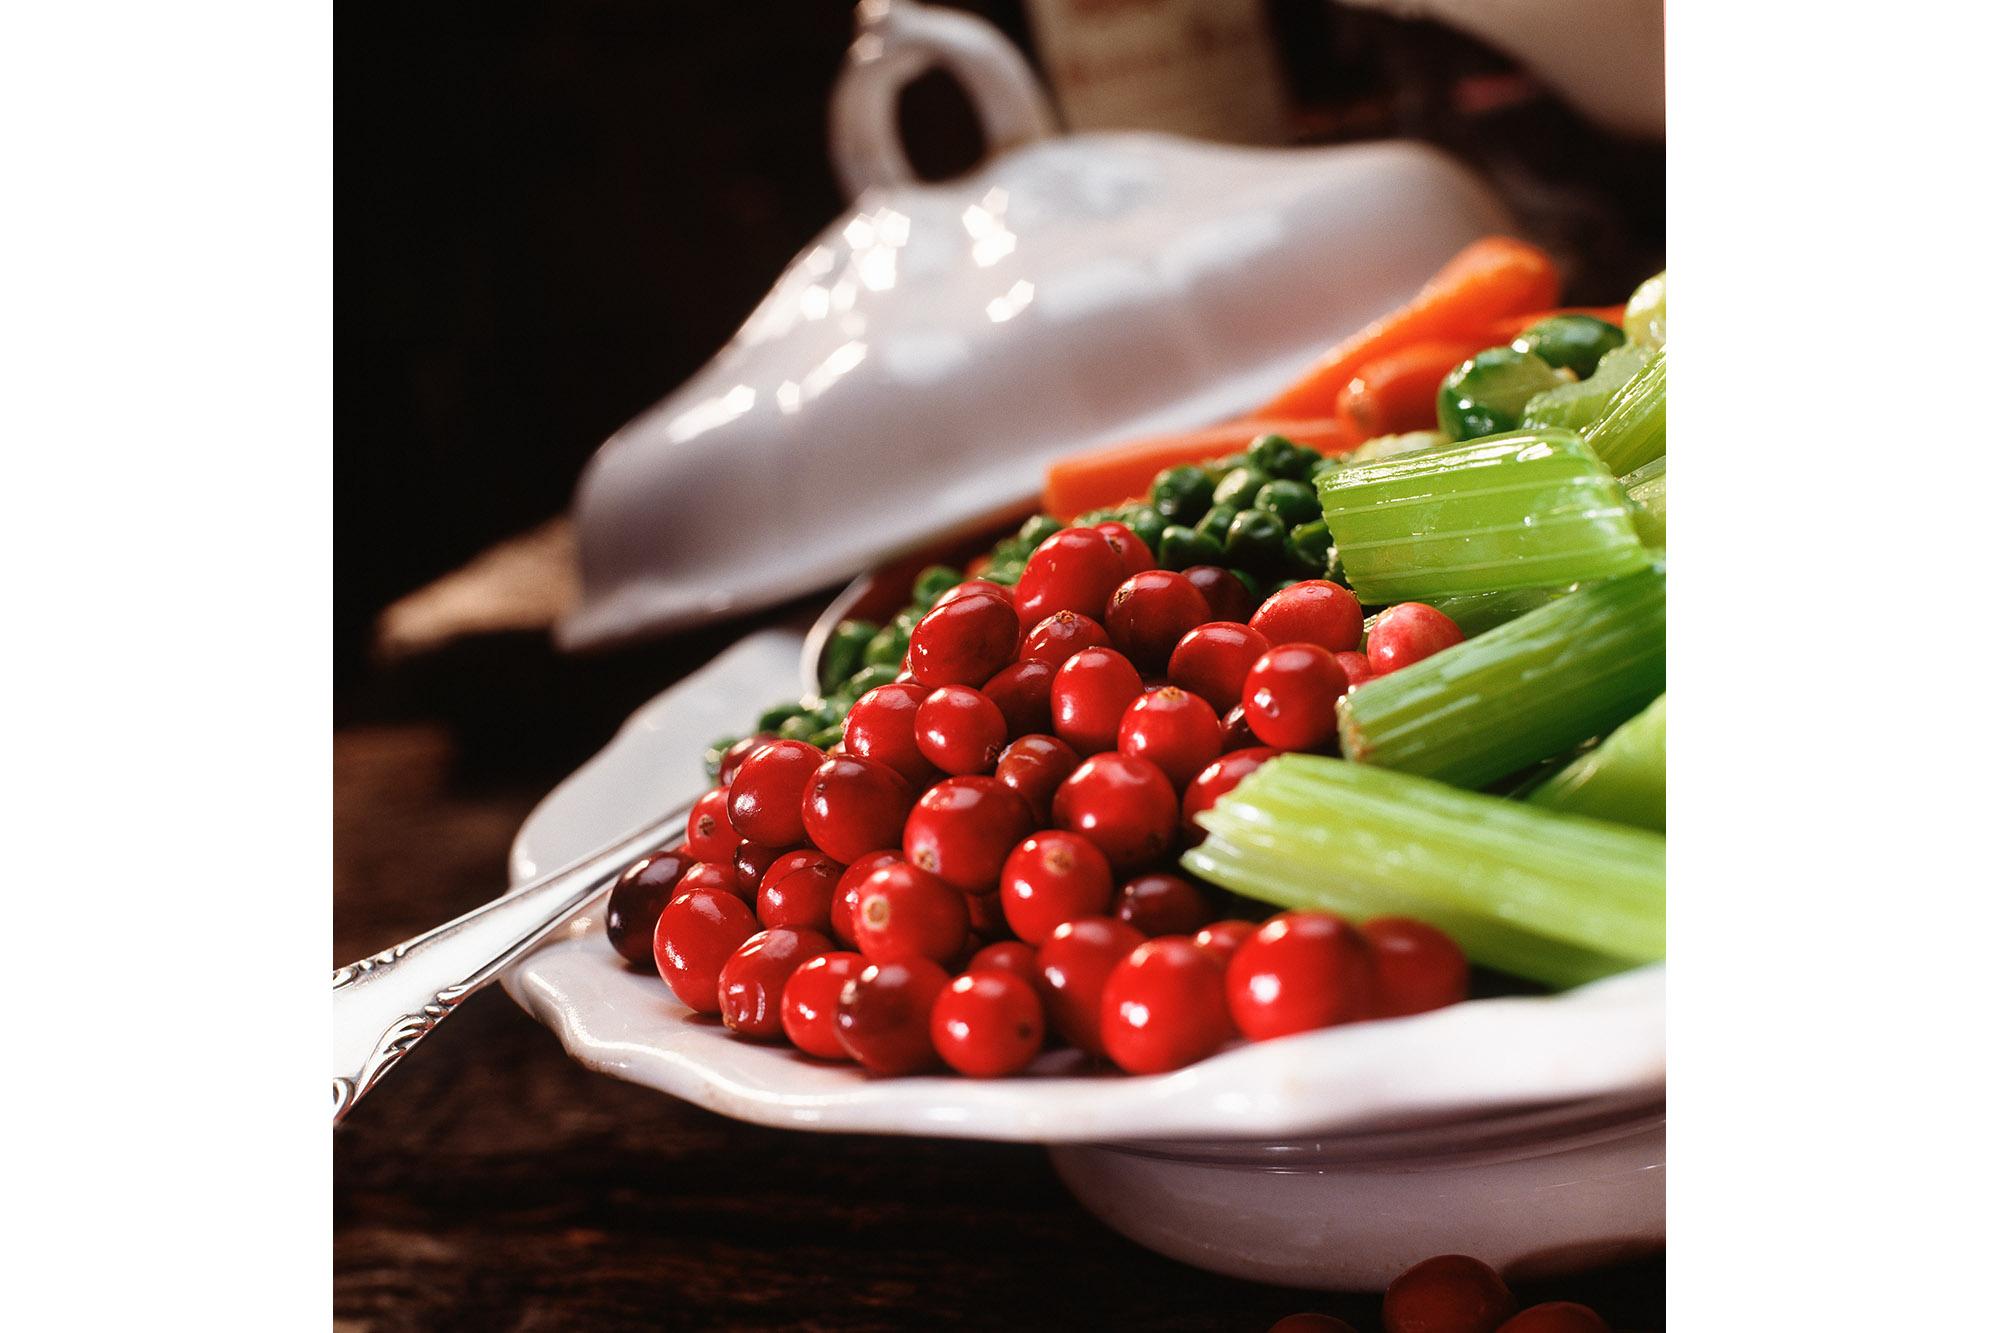 SPUISERS food voedsel stilleven Charles Petit Ueli Rohrer groente